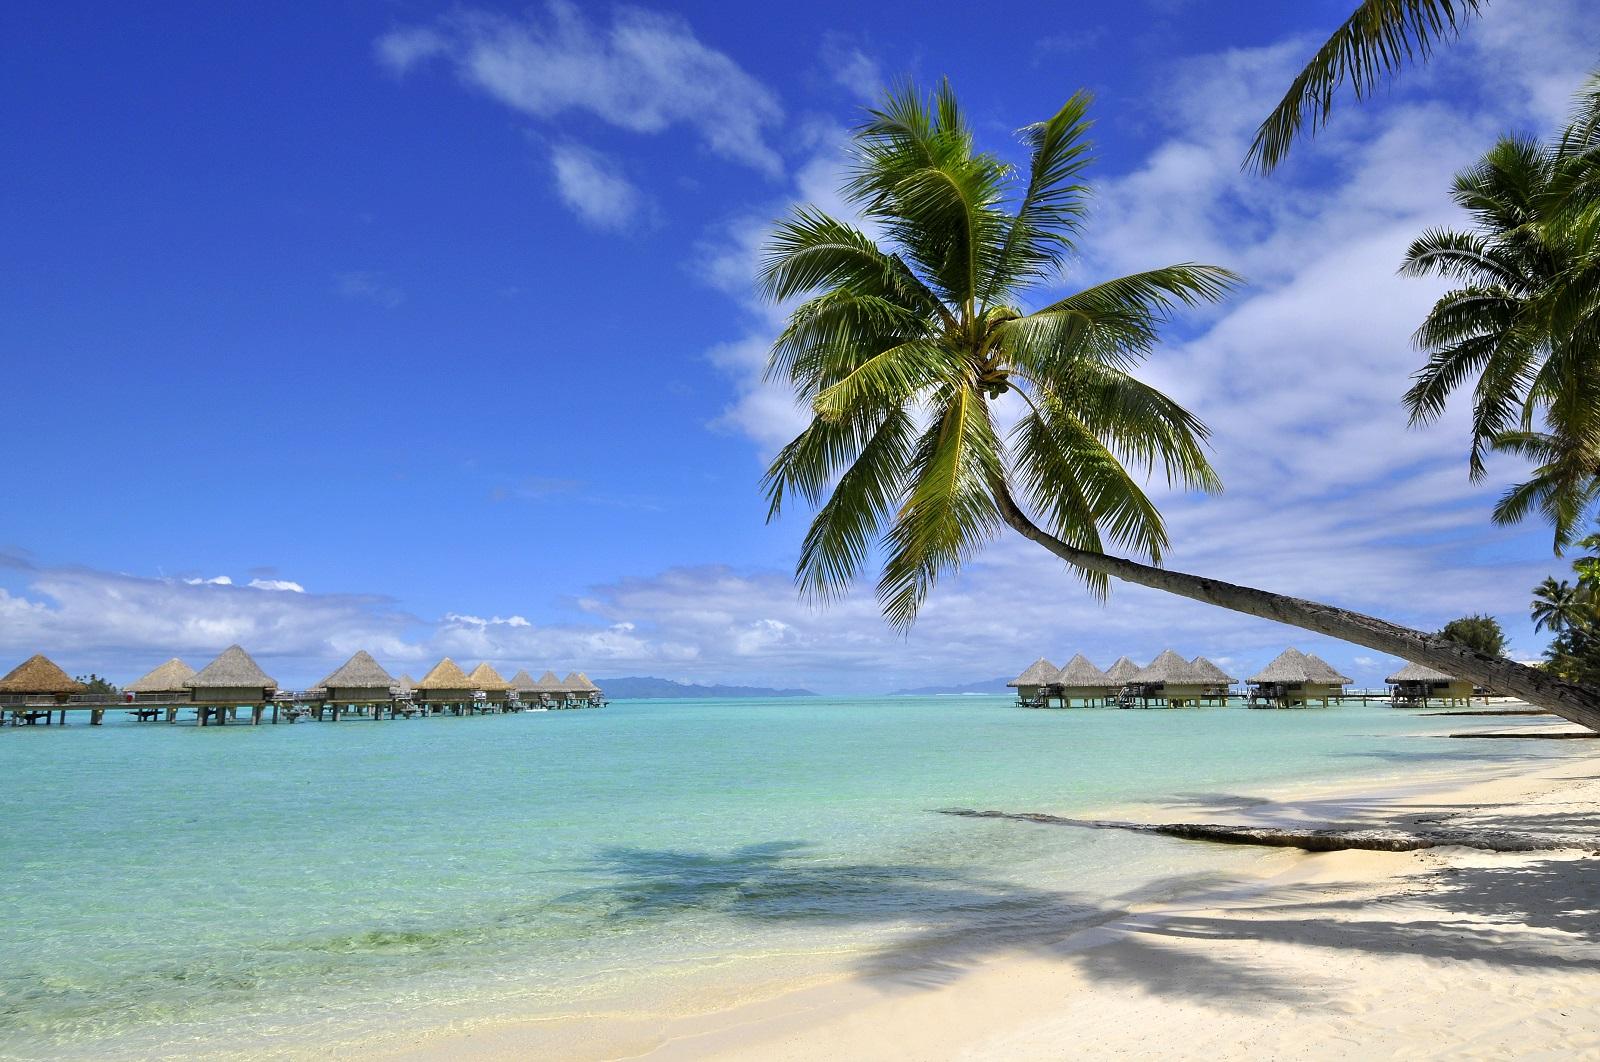 https://tahititourisme.fr/wp-content/uploads/2017/12/ic-moana-matira-beach_7461046204_o.jpg